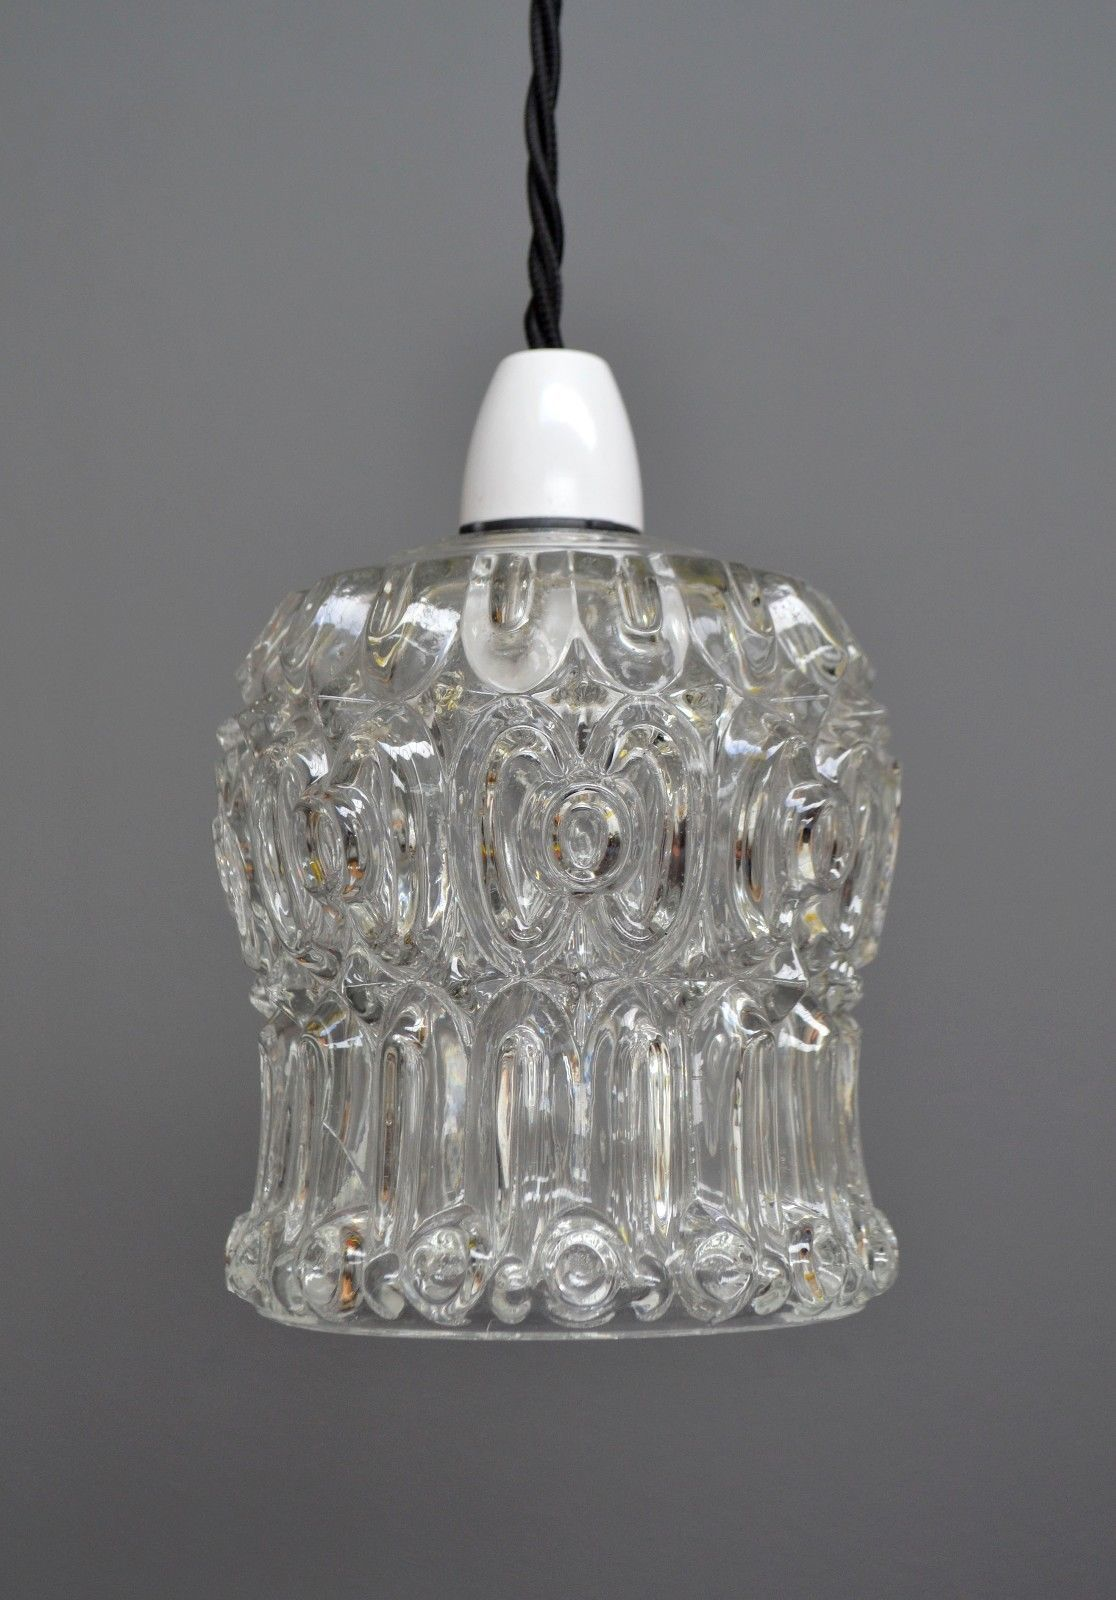 Vintage Mid Century Retro Glass Bell Shape Hanging Pendant Ceiling